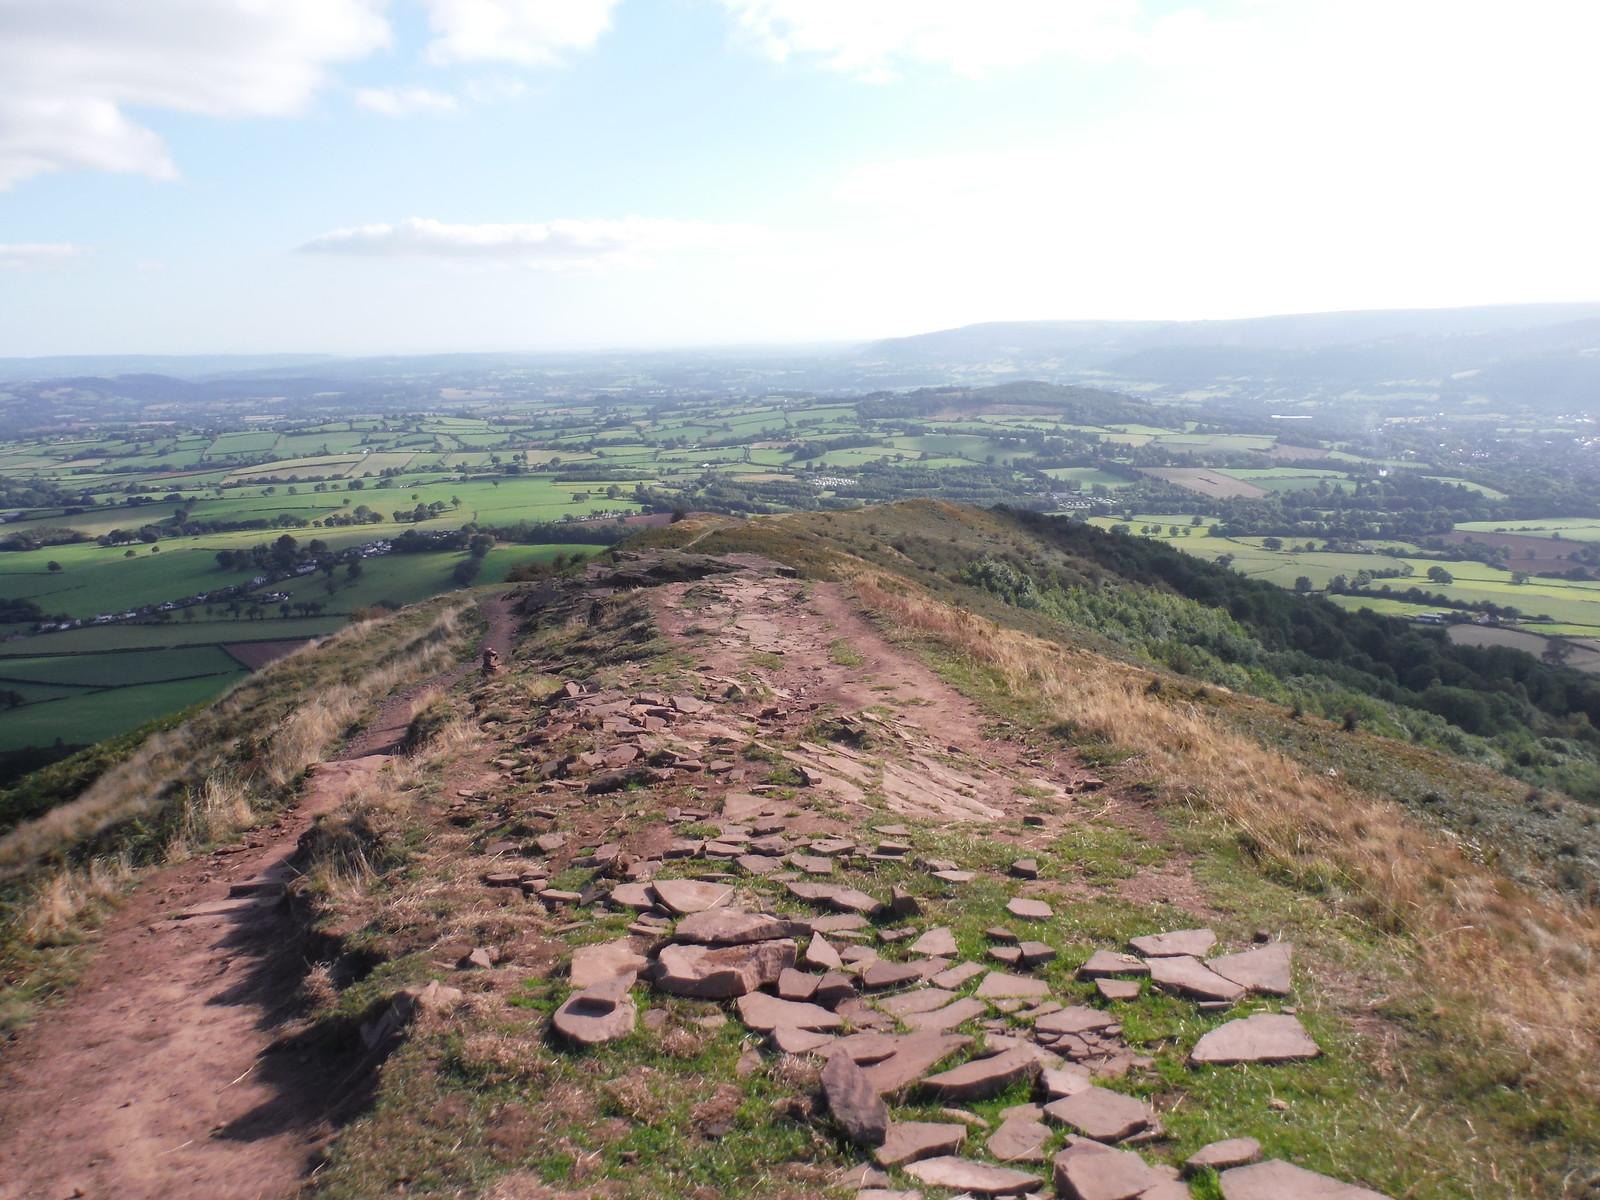 Backview from the ridge of The Skirrid SWC Walk 347 - Llanvihangel Crucorney Circular (via Bryn Arw and The Skirrid)